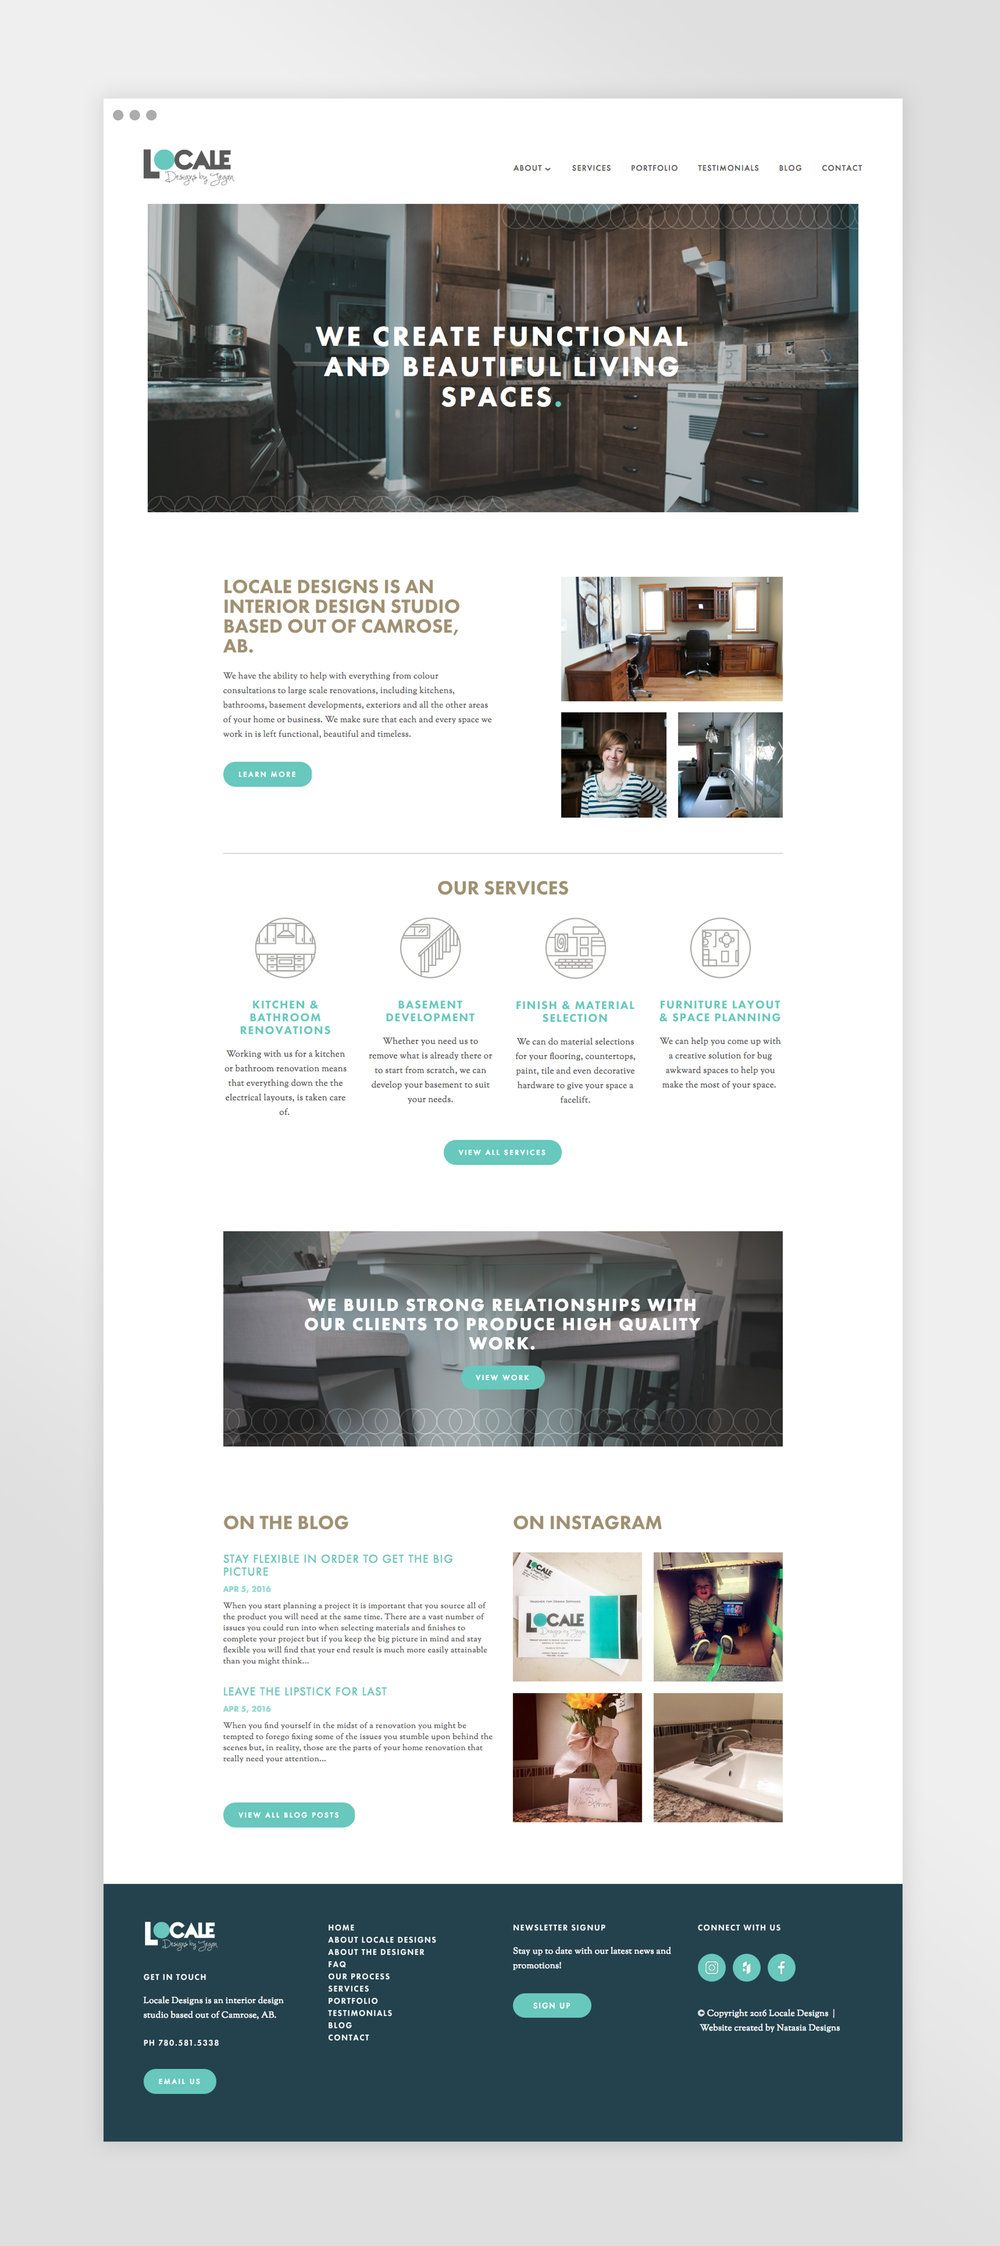 Locale Designs Website Design And Development Natasia Designs An Illustrator Graphic Designer And Web Web Design Quotes Online Web Design Web Design Tips